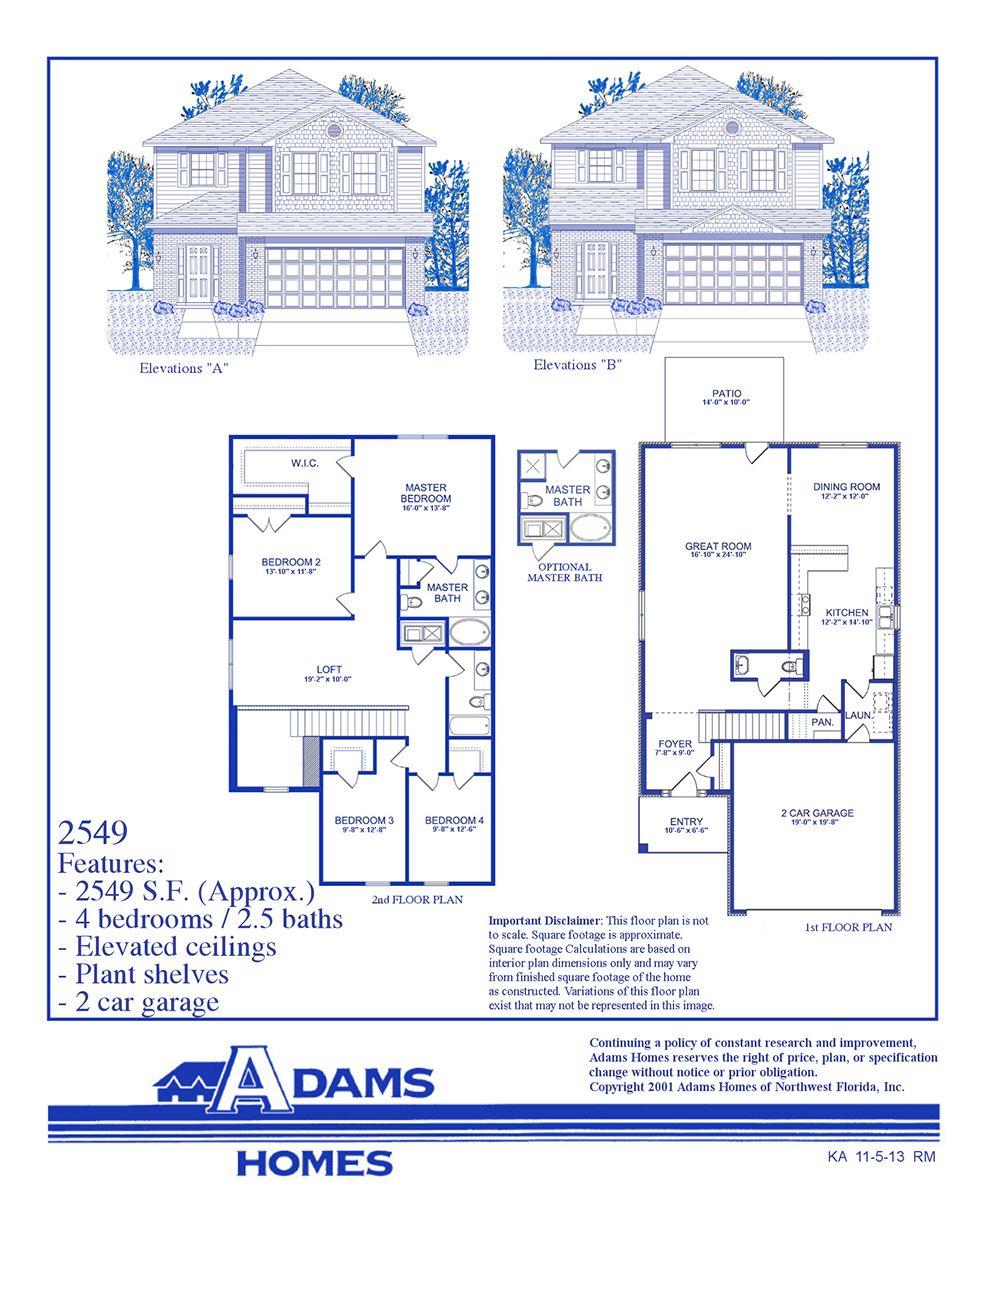 Fresh Adams Homes Floor Plans 10 Theory House Plans Gallery Ideas